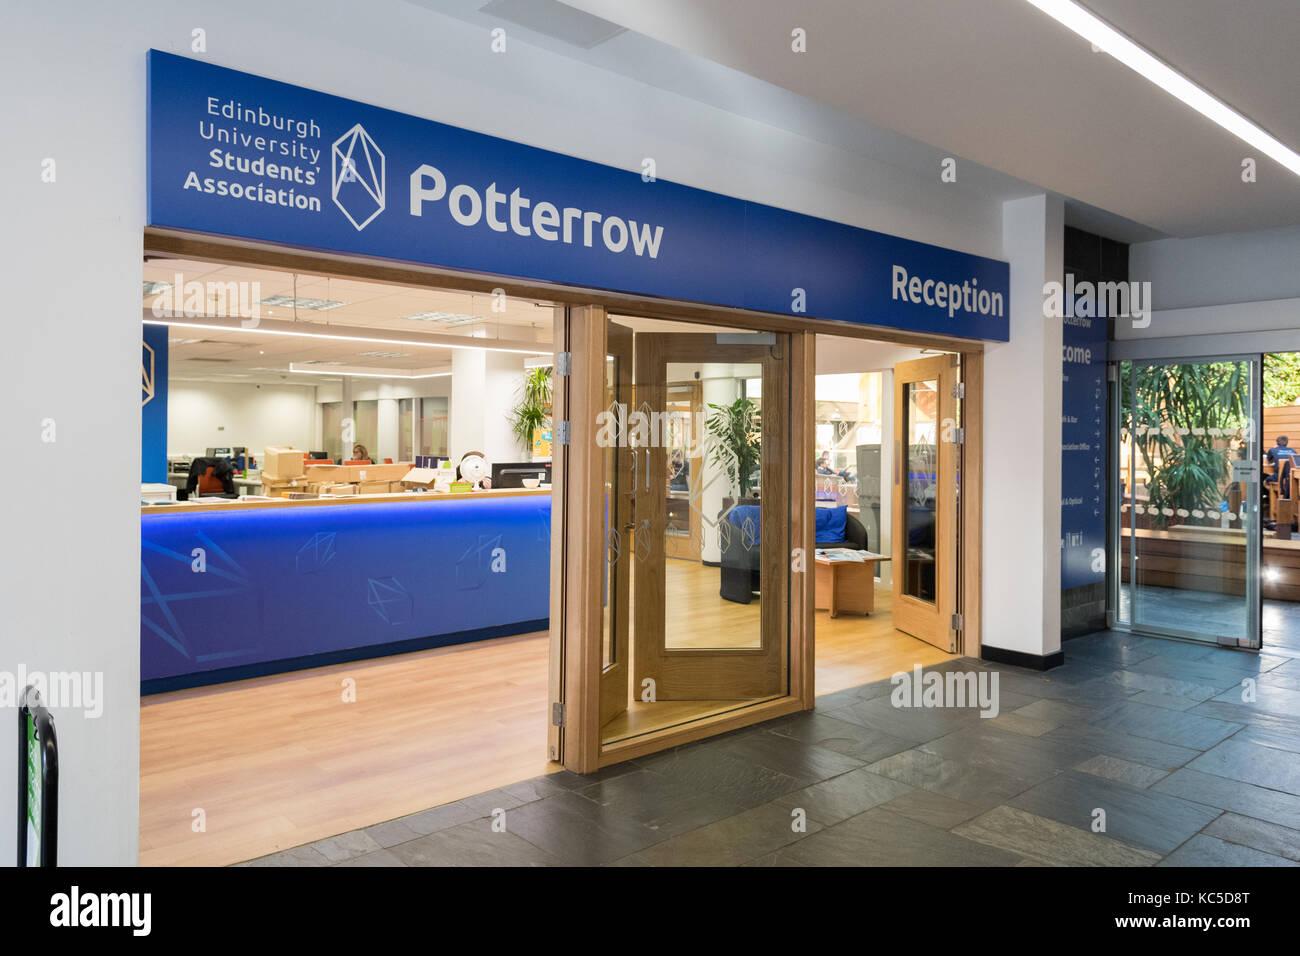 Potterrow - Edinburgh University Students Association reception - Stock Image